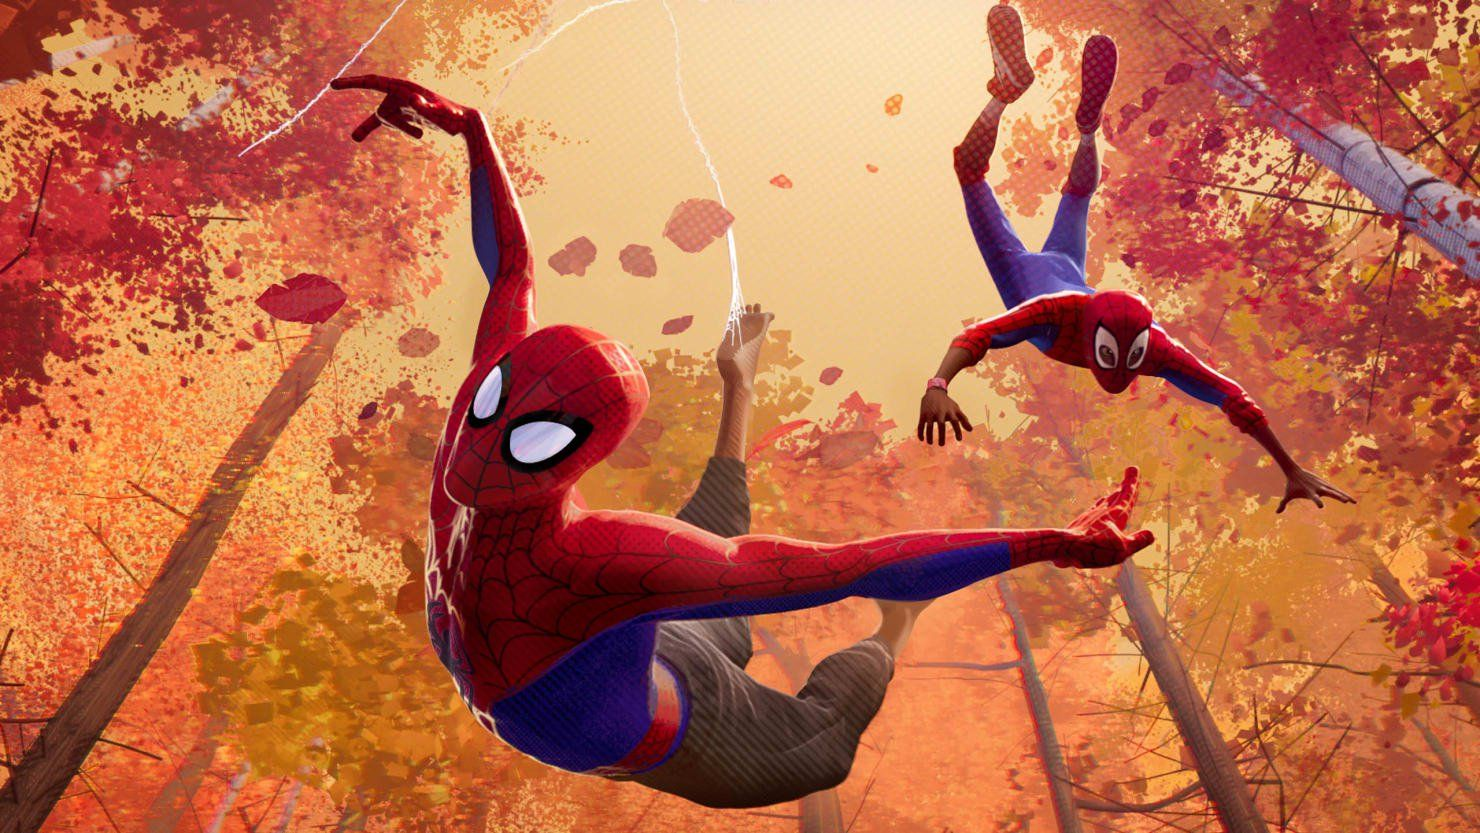 Spider Man Into The Spider Verse Is A Radical Reimagining Of The Superhero Film Animated Spider Spider Verse Spiderman